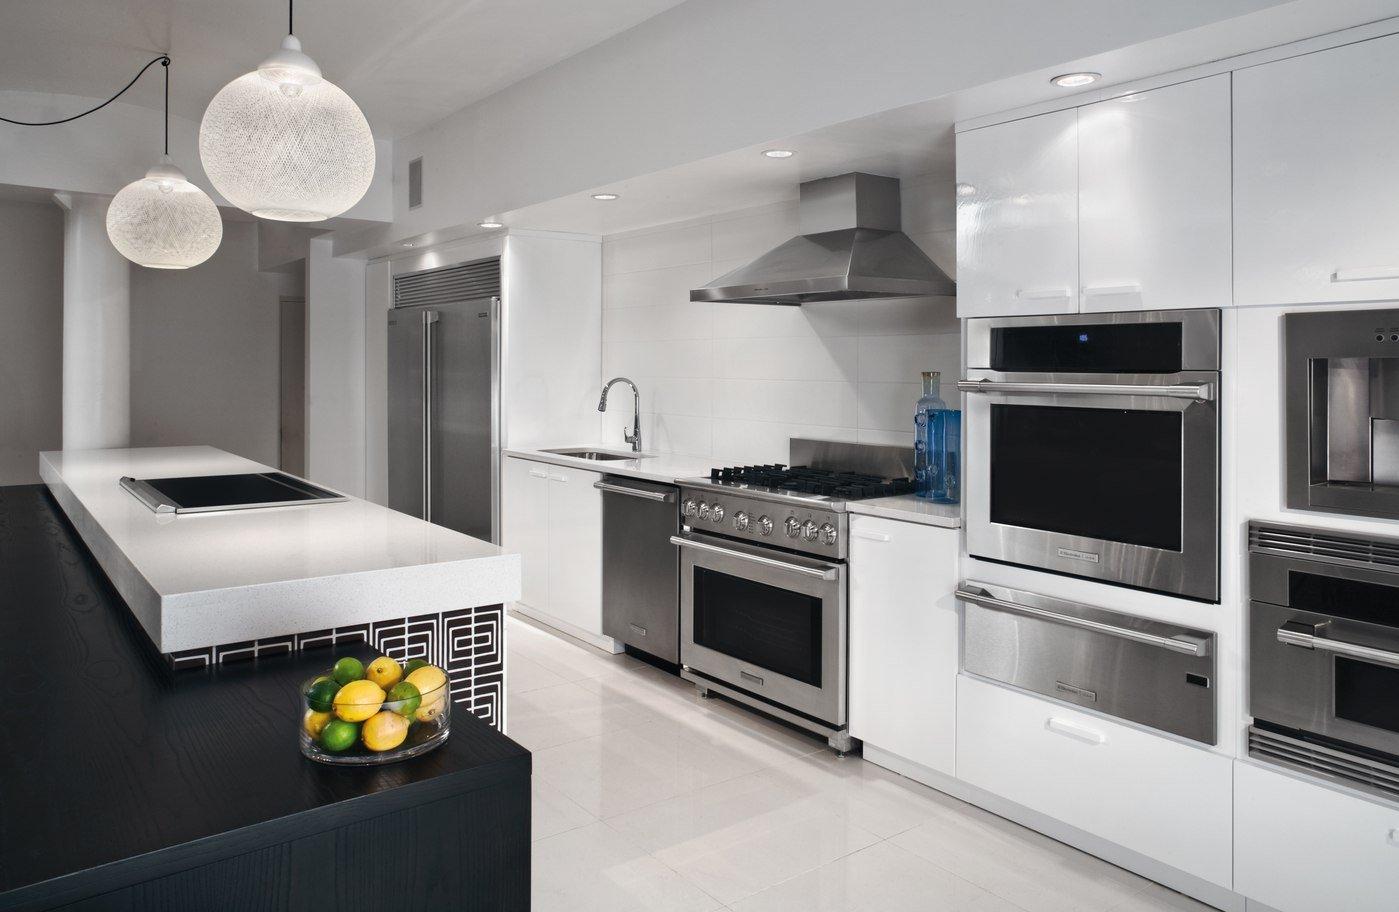 kitchen aide dishwasher vigo sinks the 5 best affordable luxury appliance brands (reviews ...